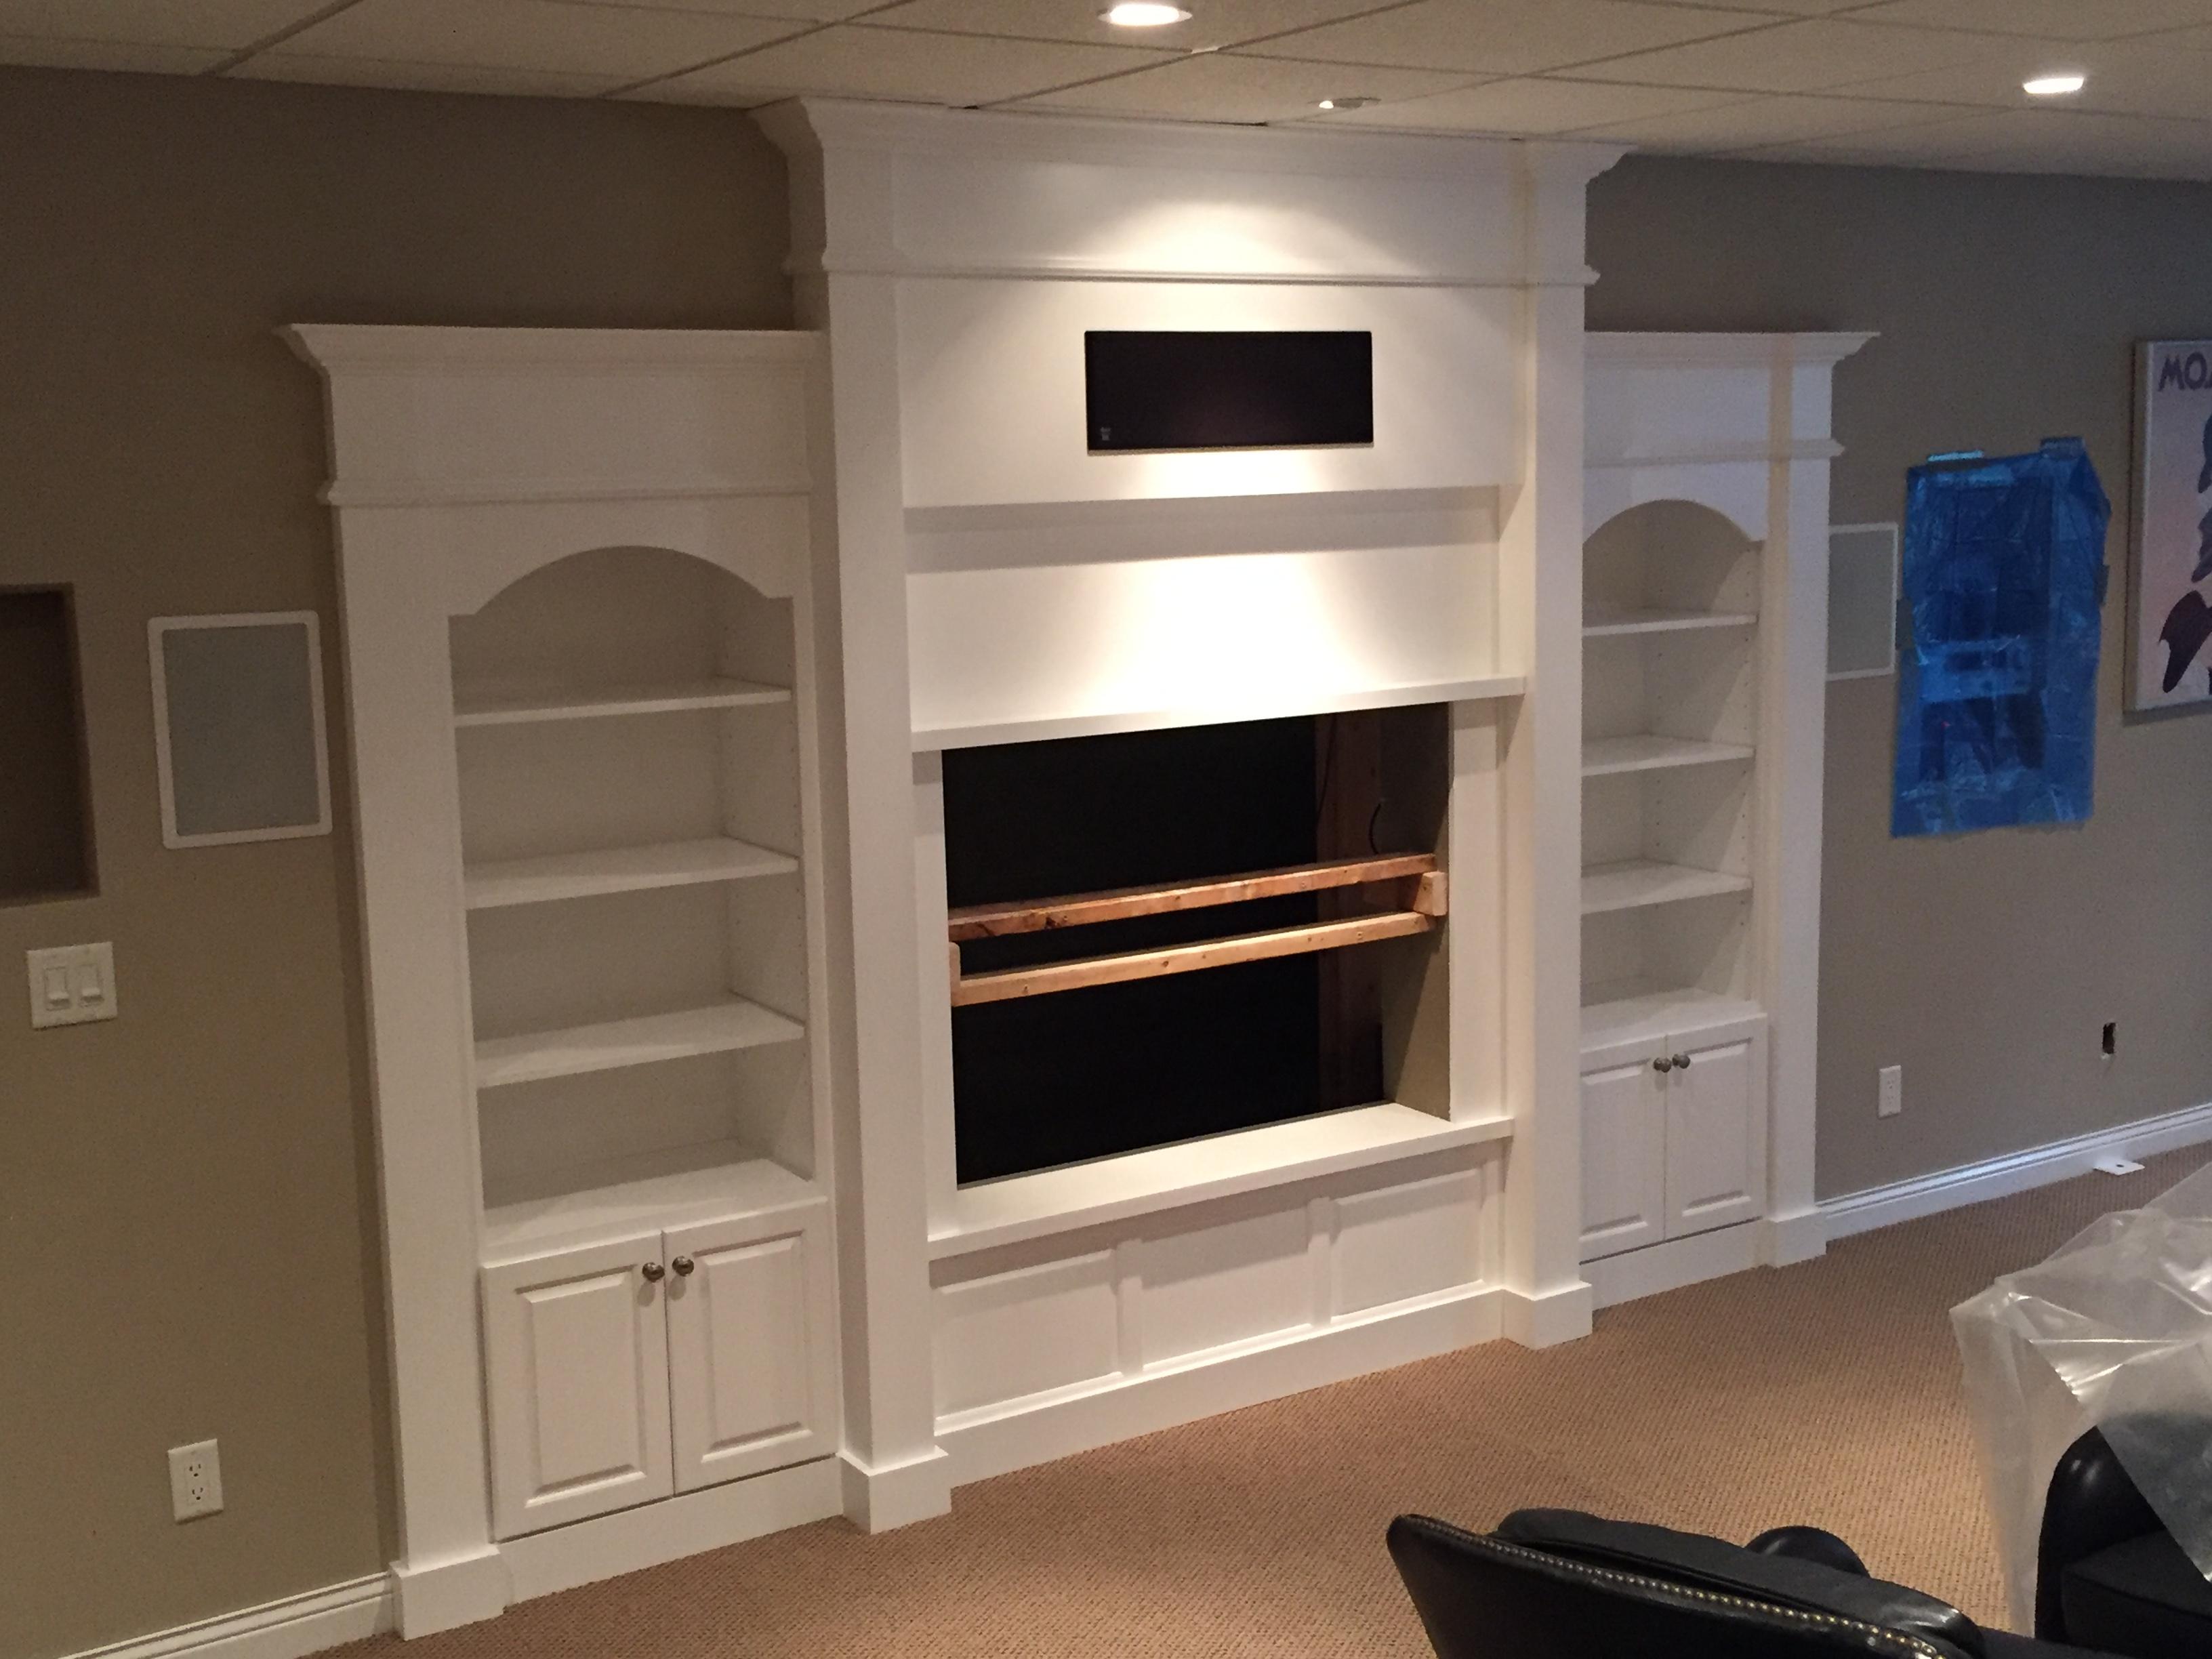 Cabinet & Moulding Installation